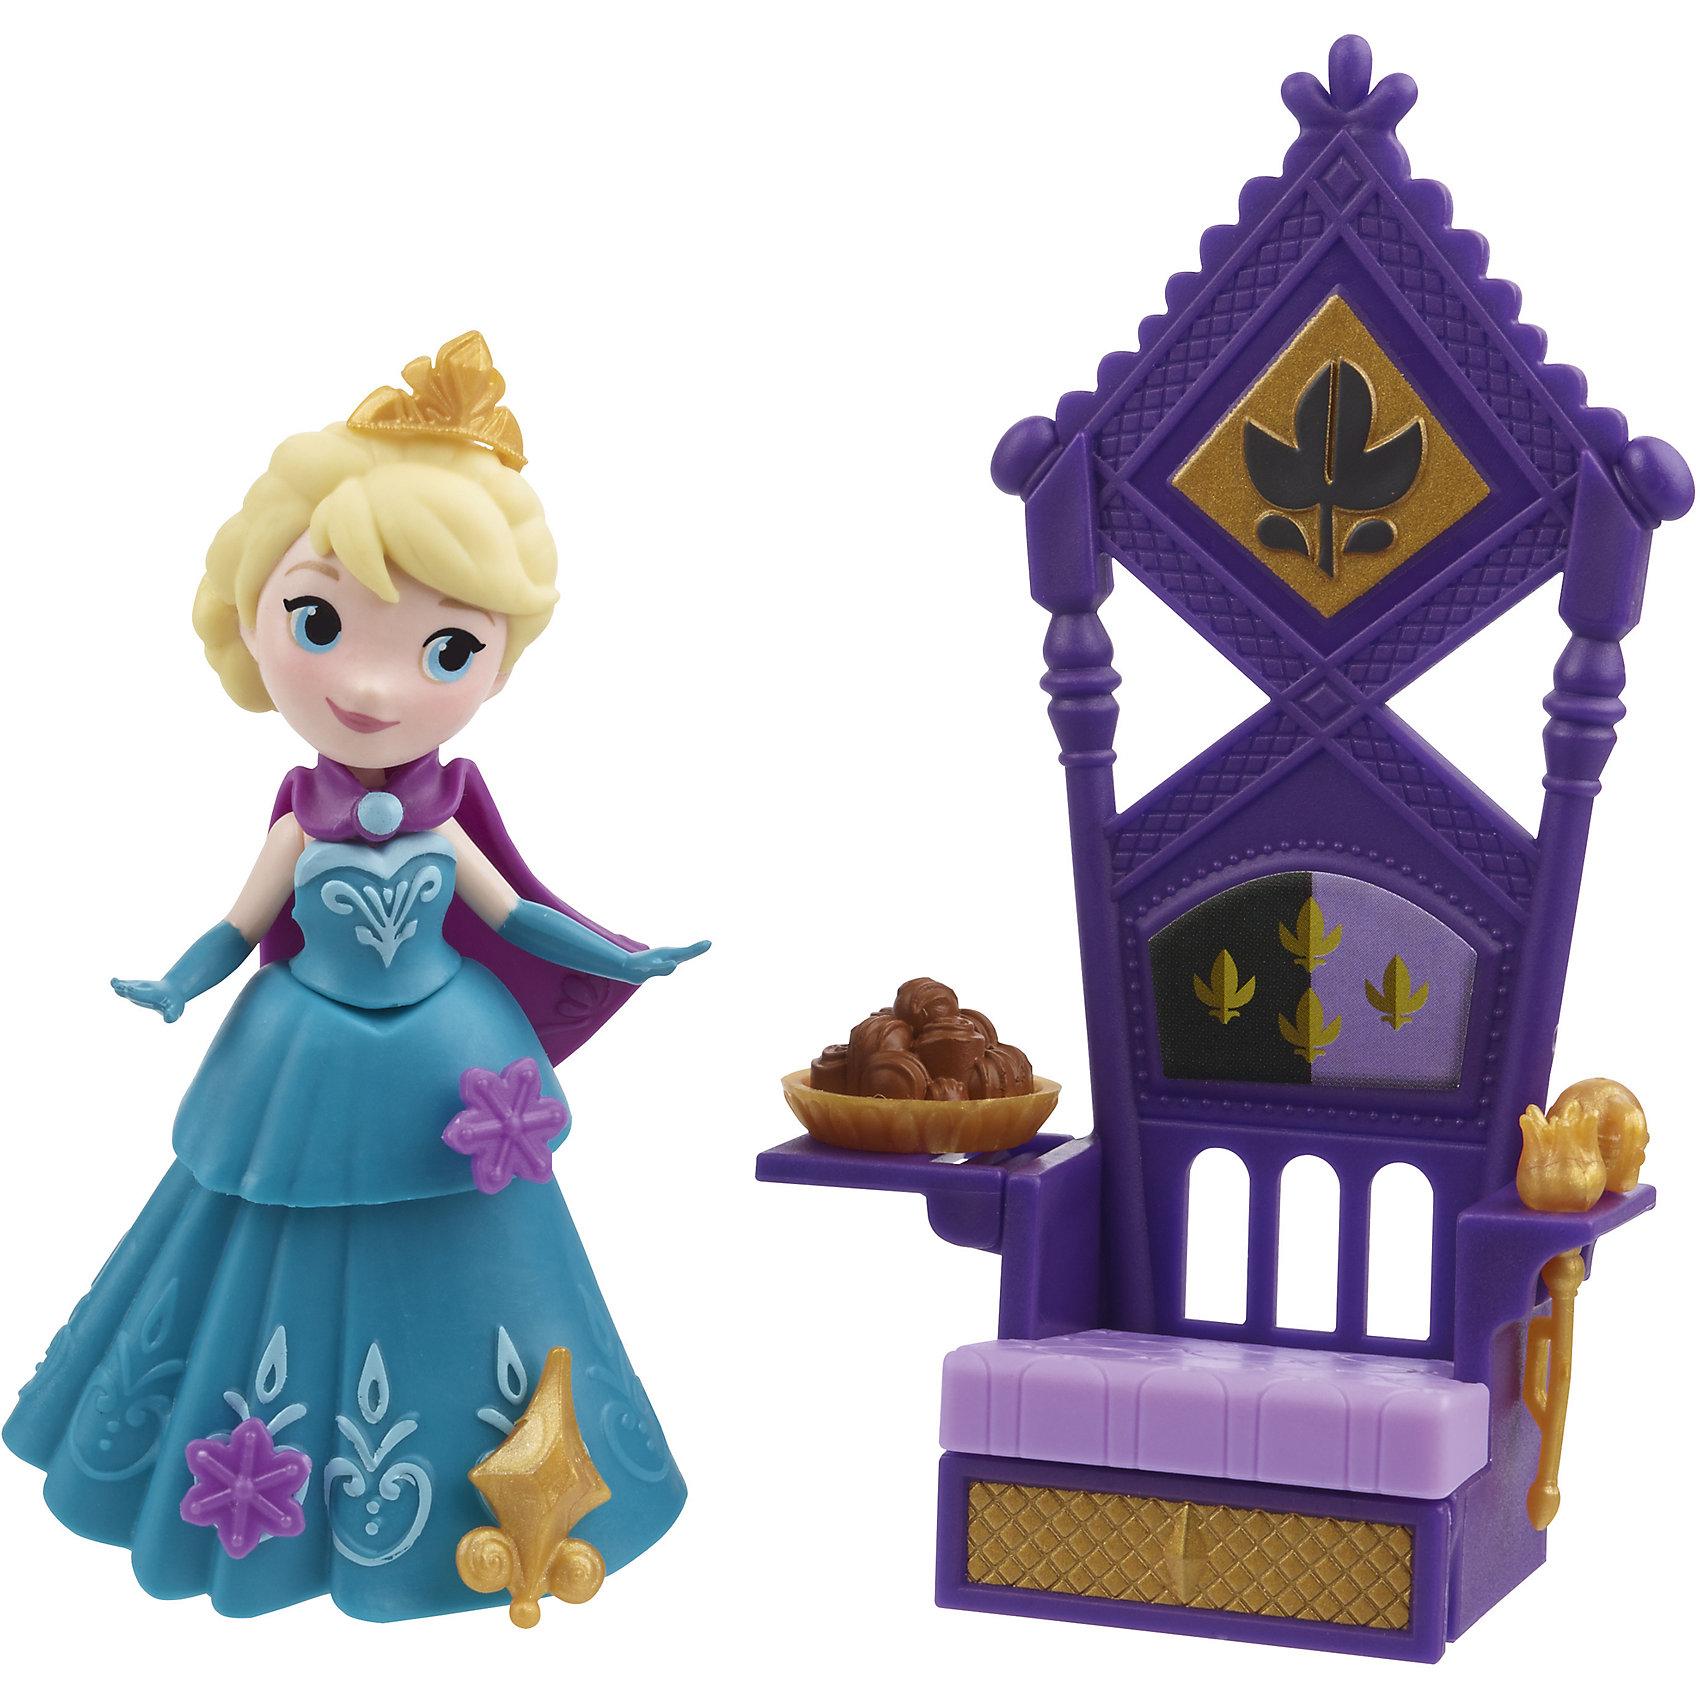 Hasbro Мини-кукла с аксессуарами, Холодное Сердце hasbro кукла рапунцель принцессы дисней